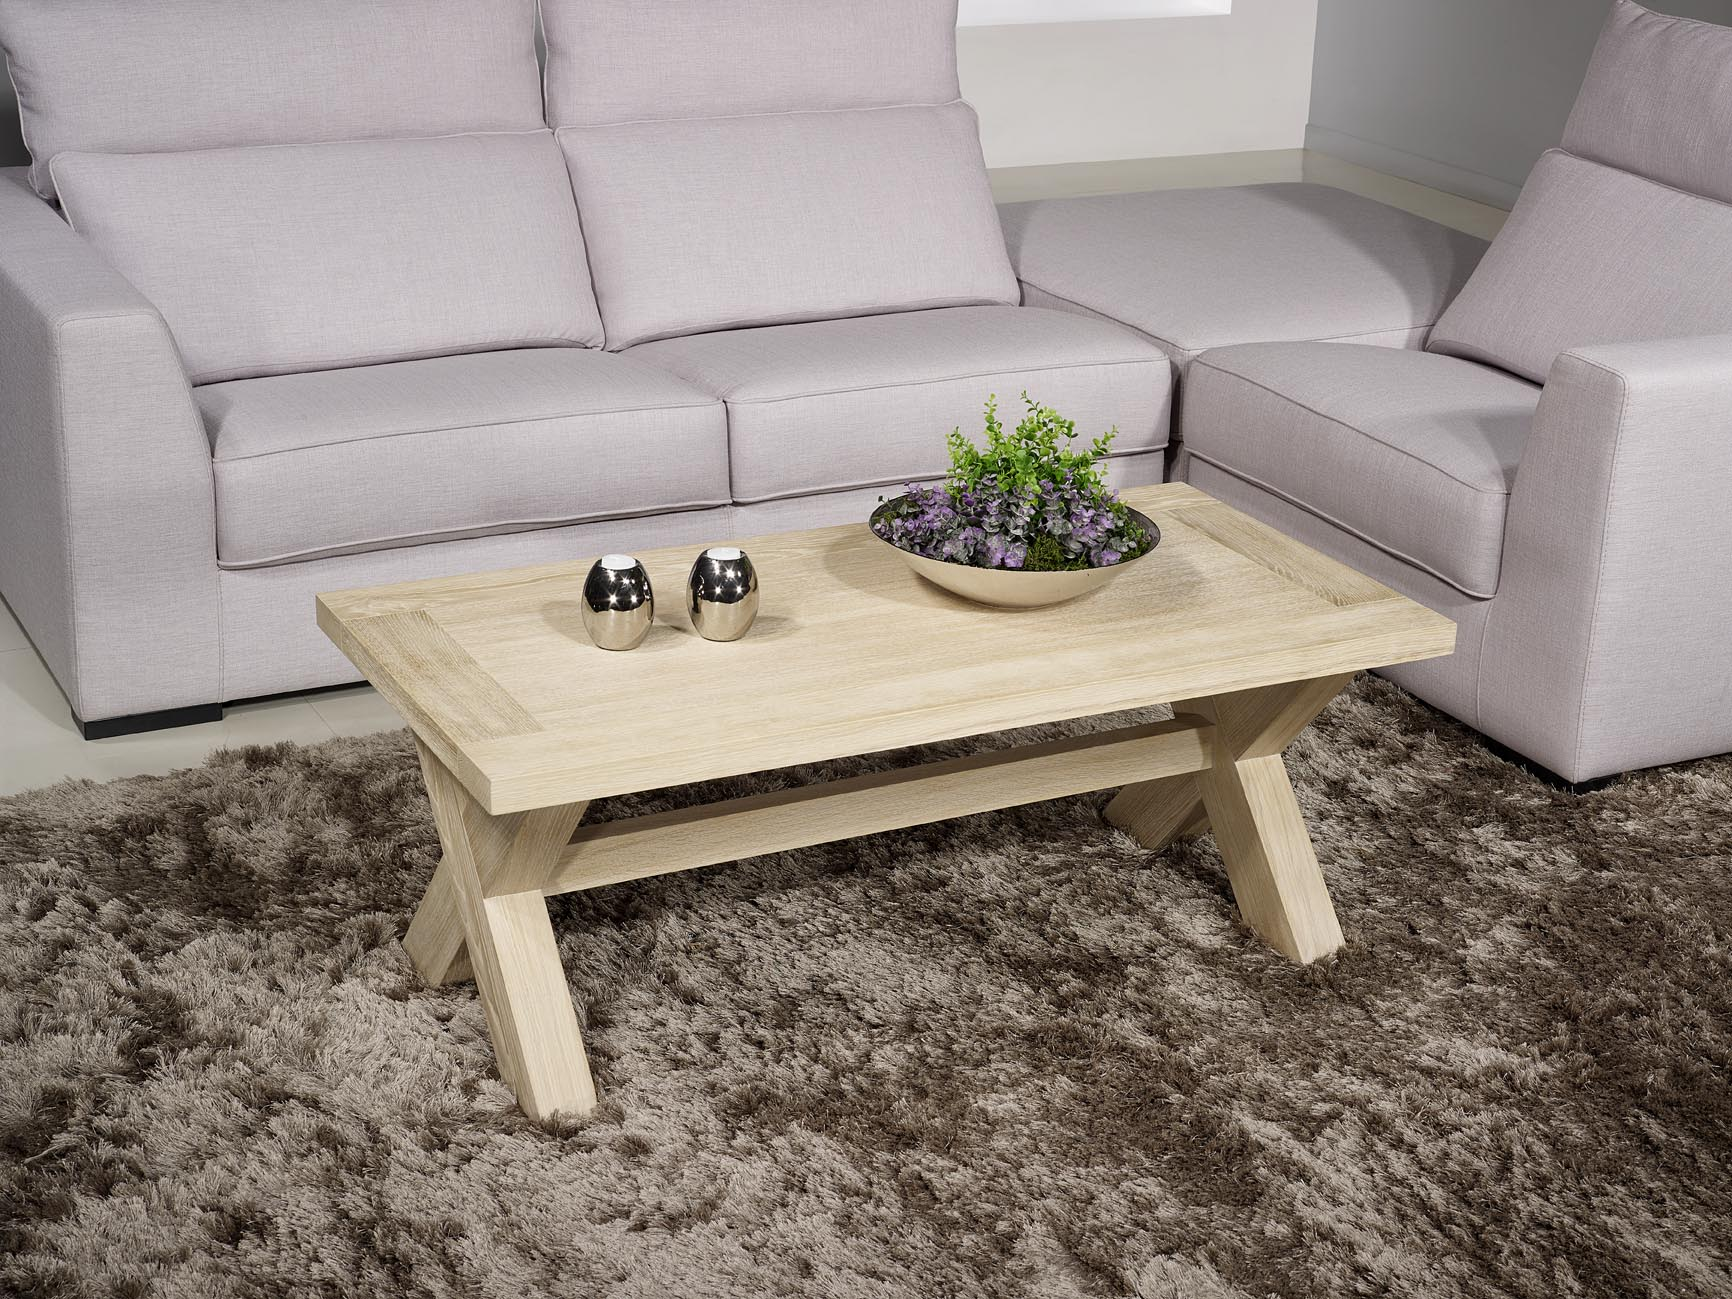 table basse rectangulaire en ch ne de style campagnard finition ch ne bross meuble en ch ne. Black Bedroom Furniture Sets. Home Design Ideas